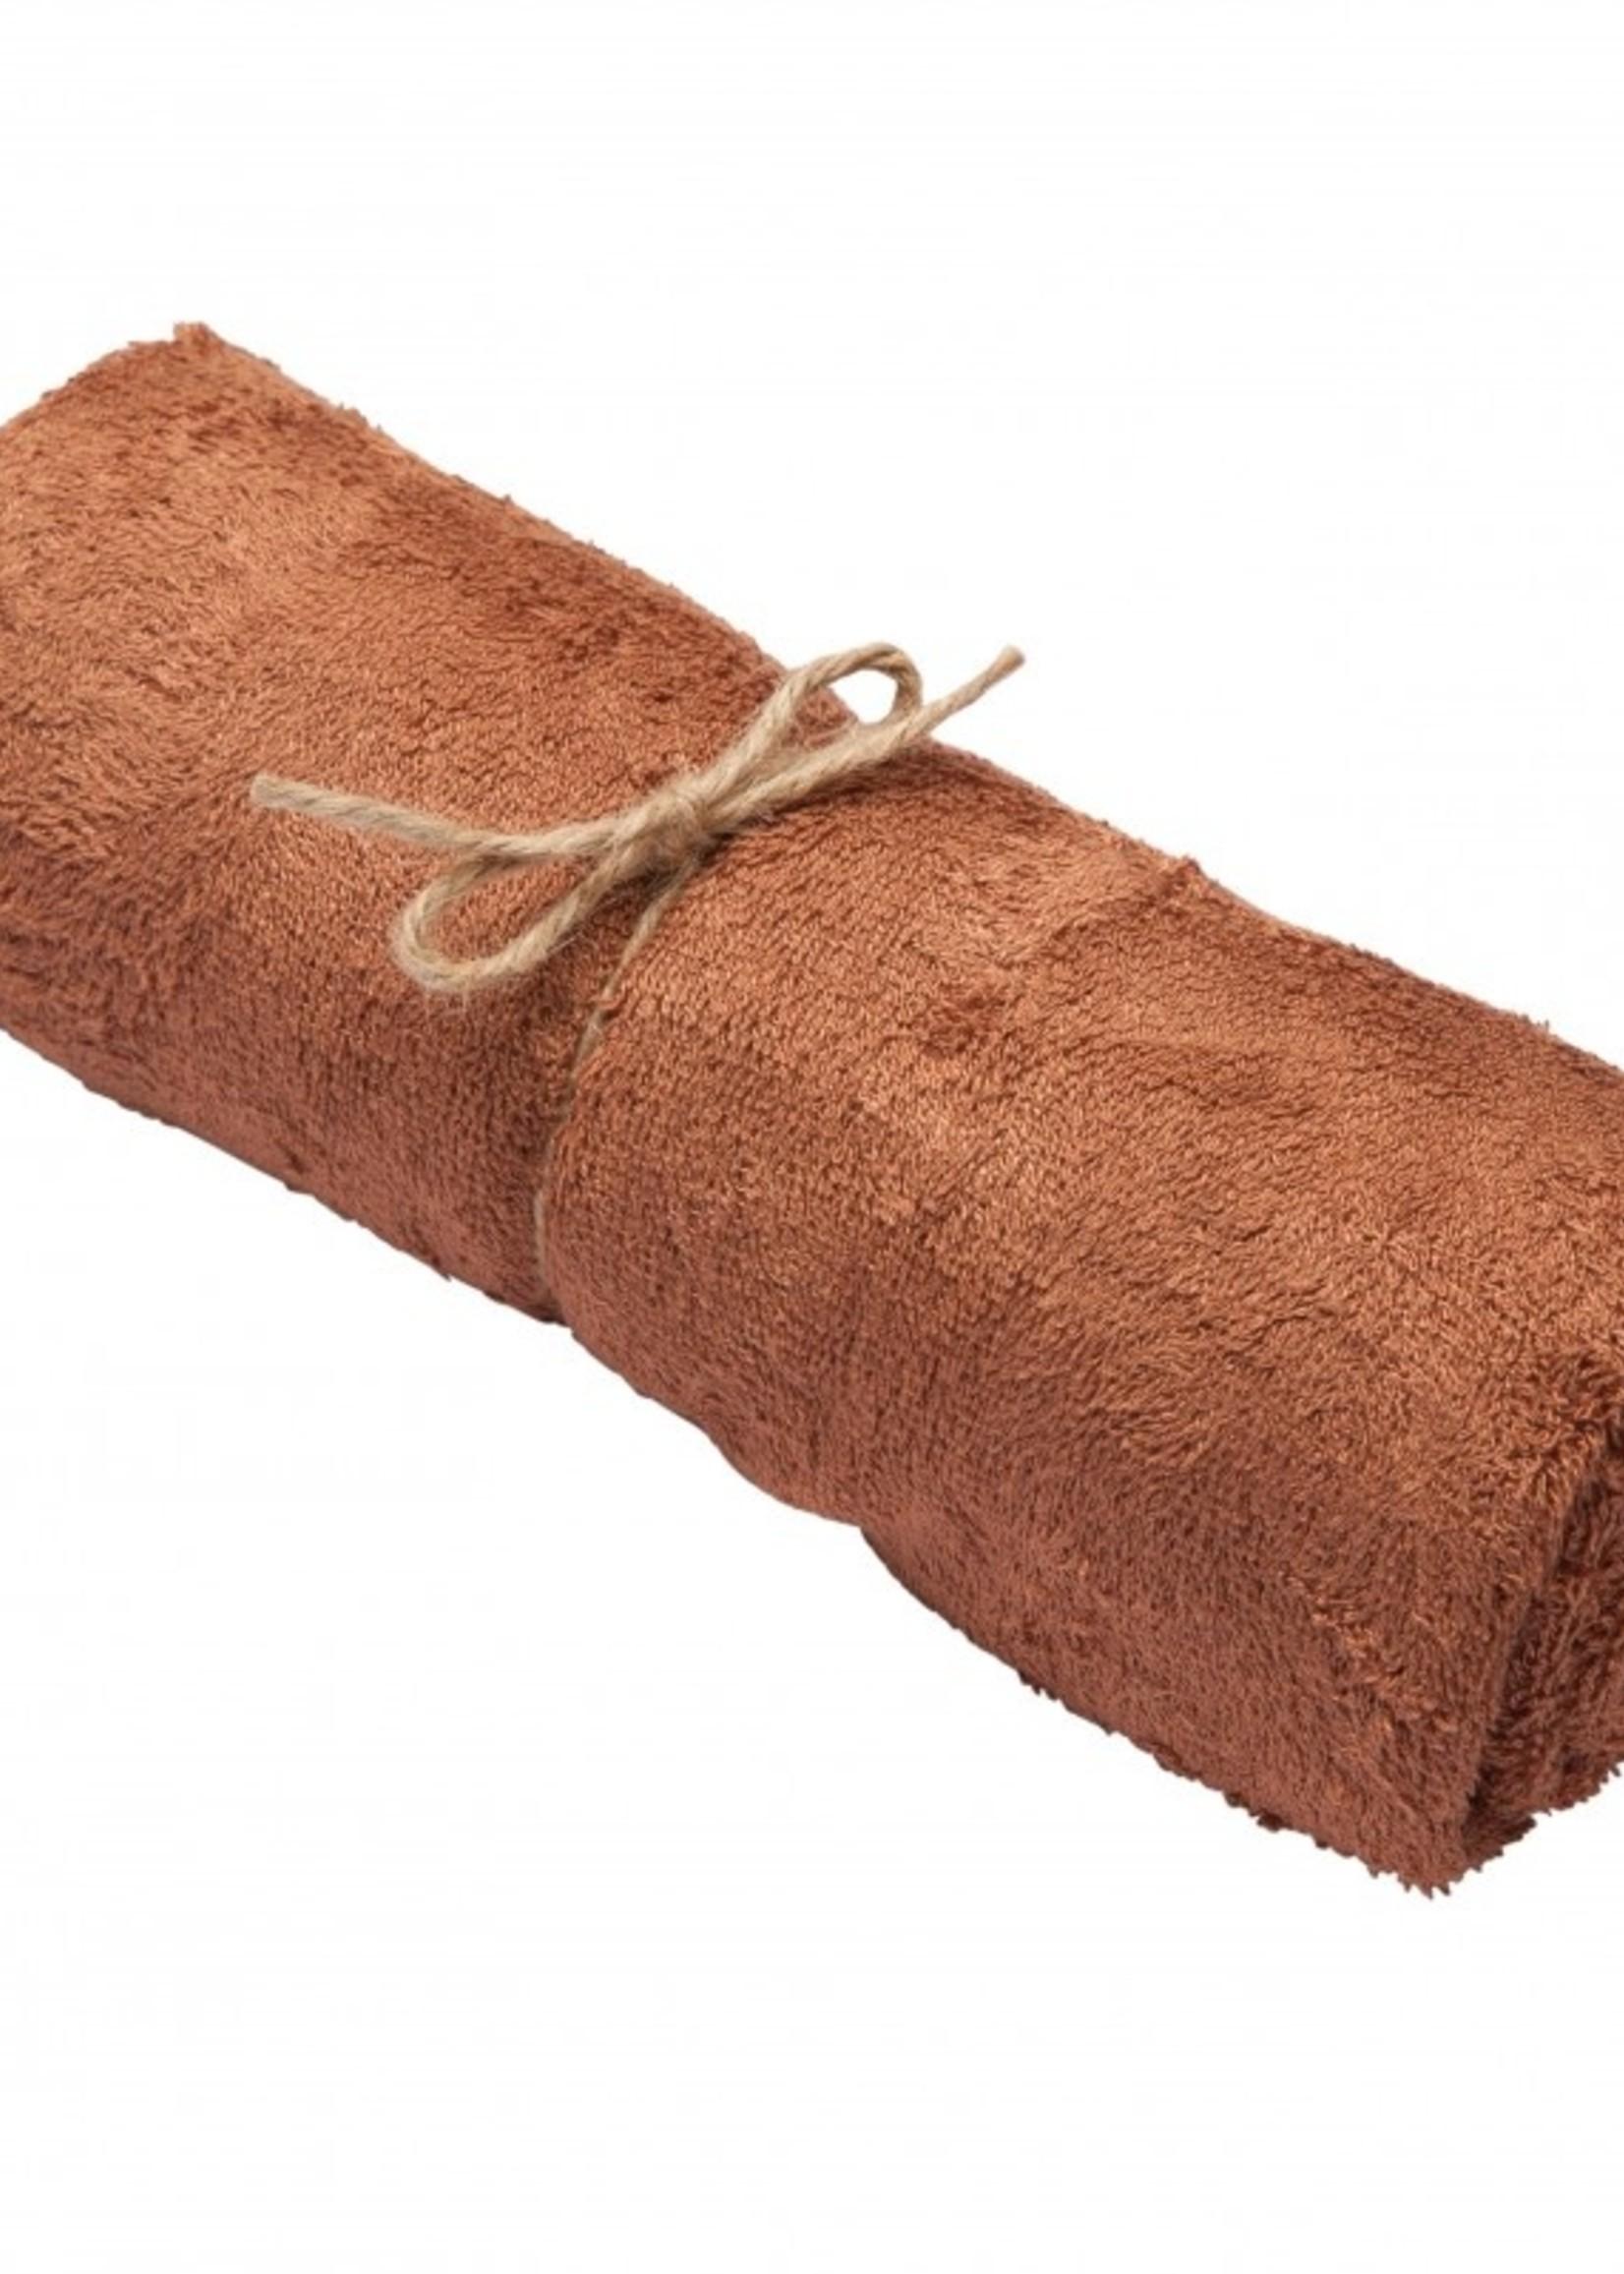 Timboo Towel Large - Hazel Brown